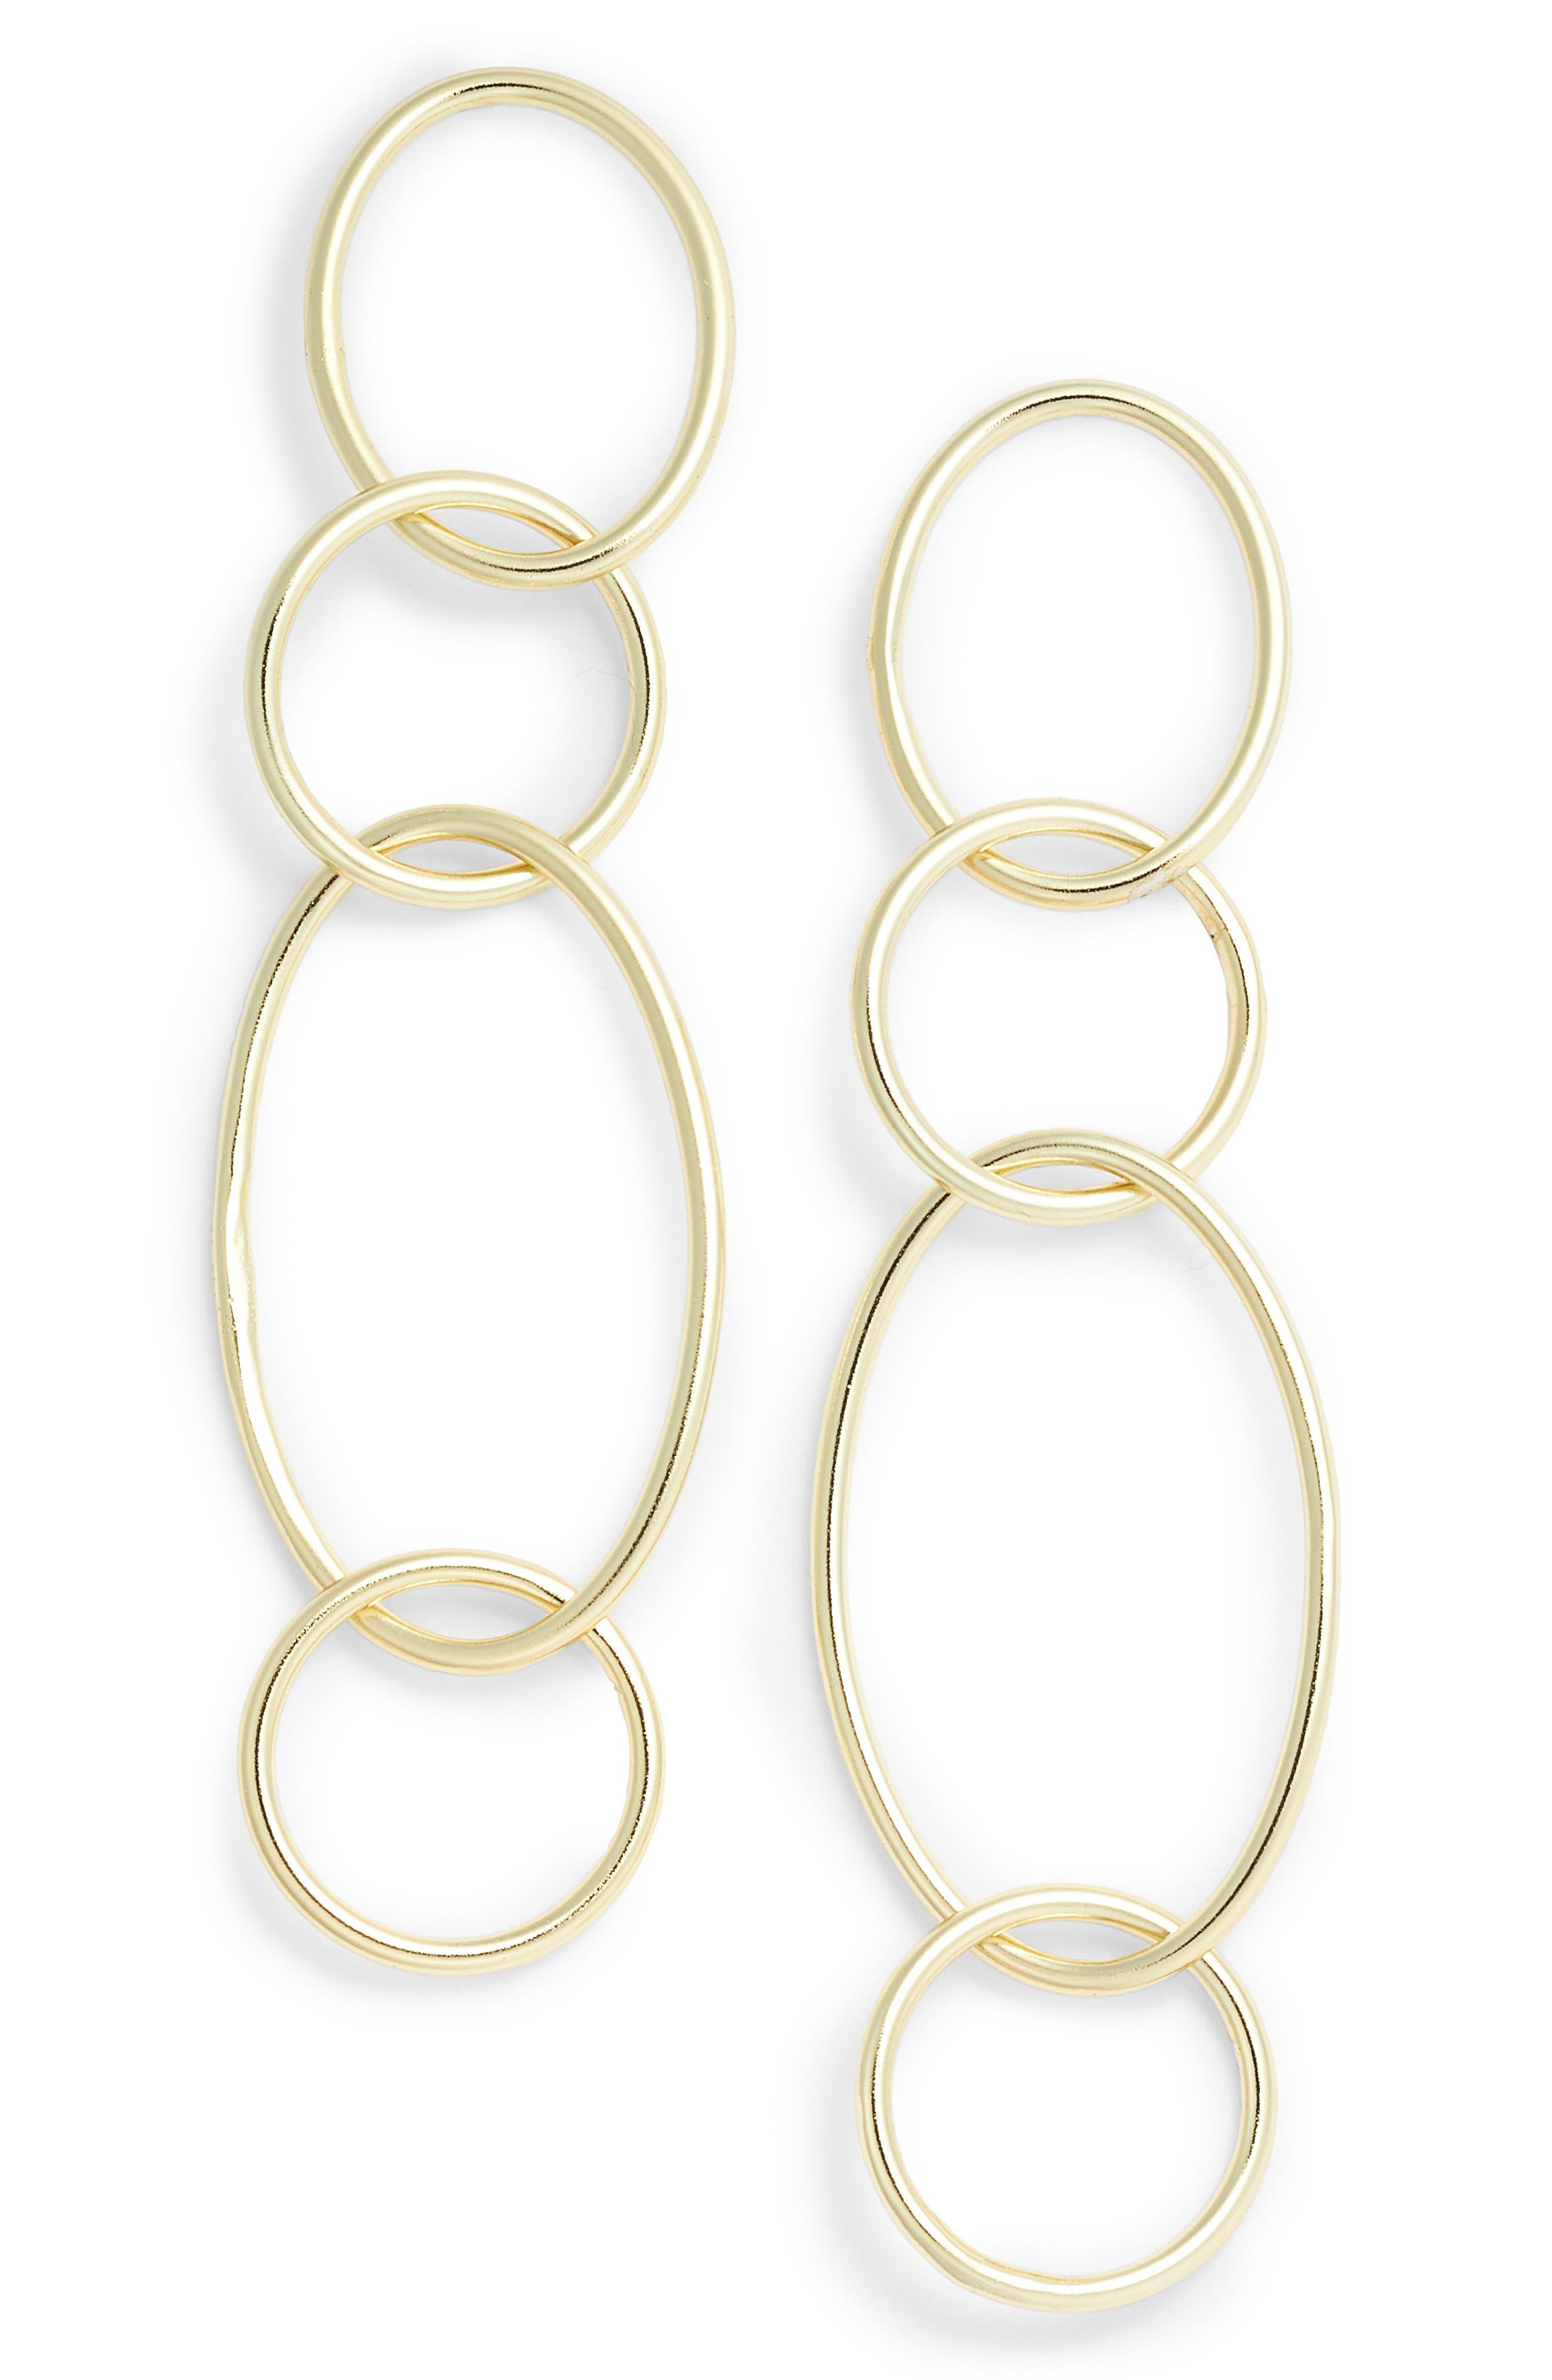 Drop Link Earrings,                             Main thumbnail 1, color,                             Gold